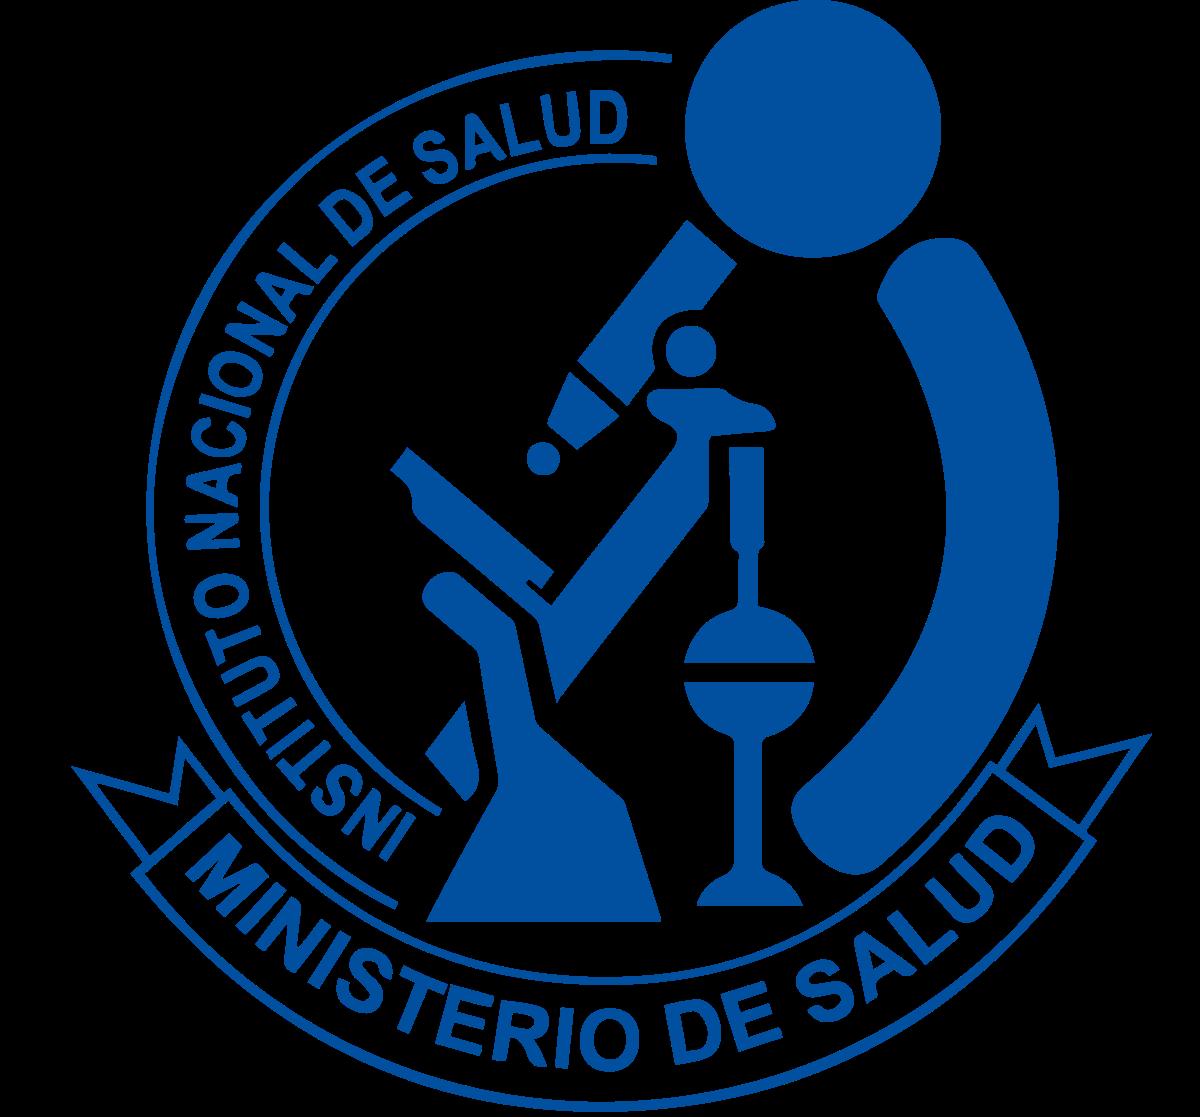 ministerio de salud, peru